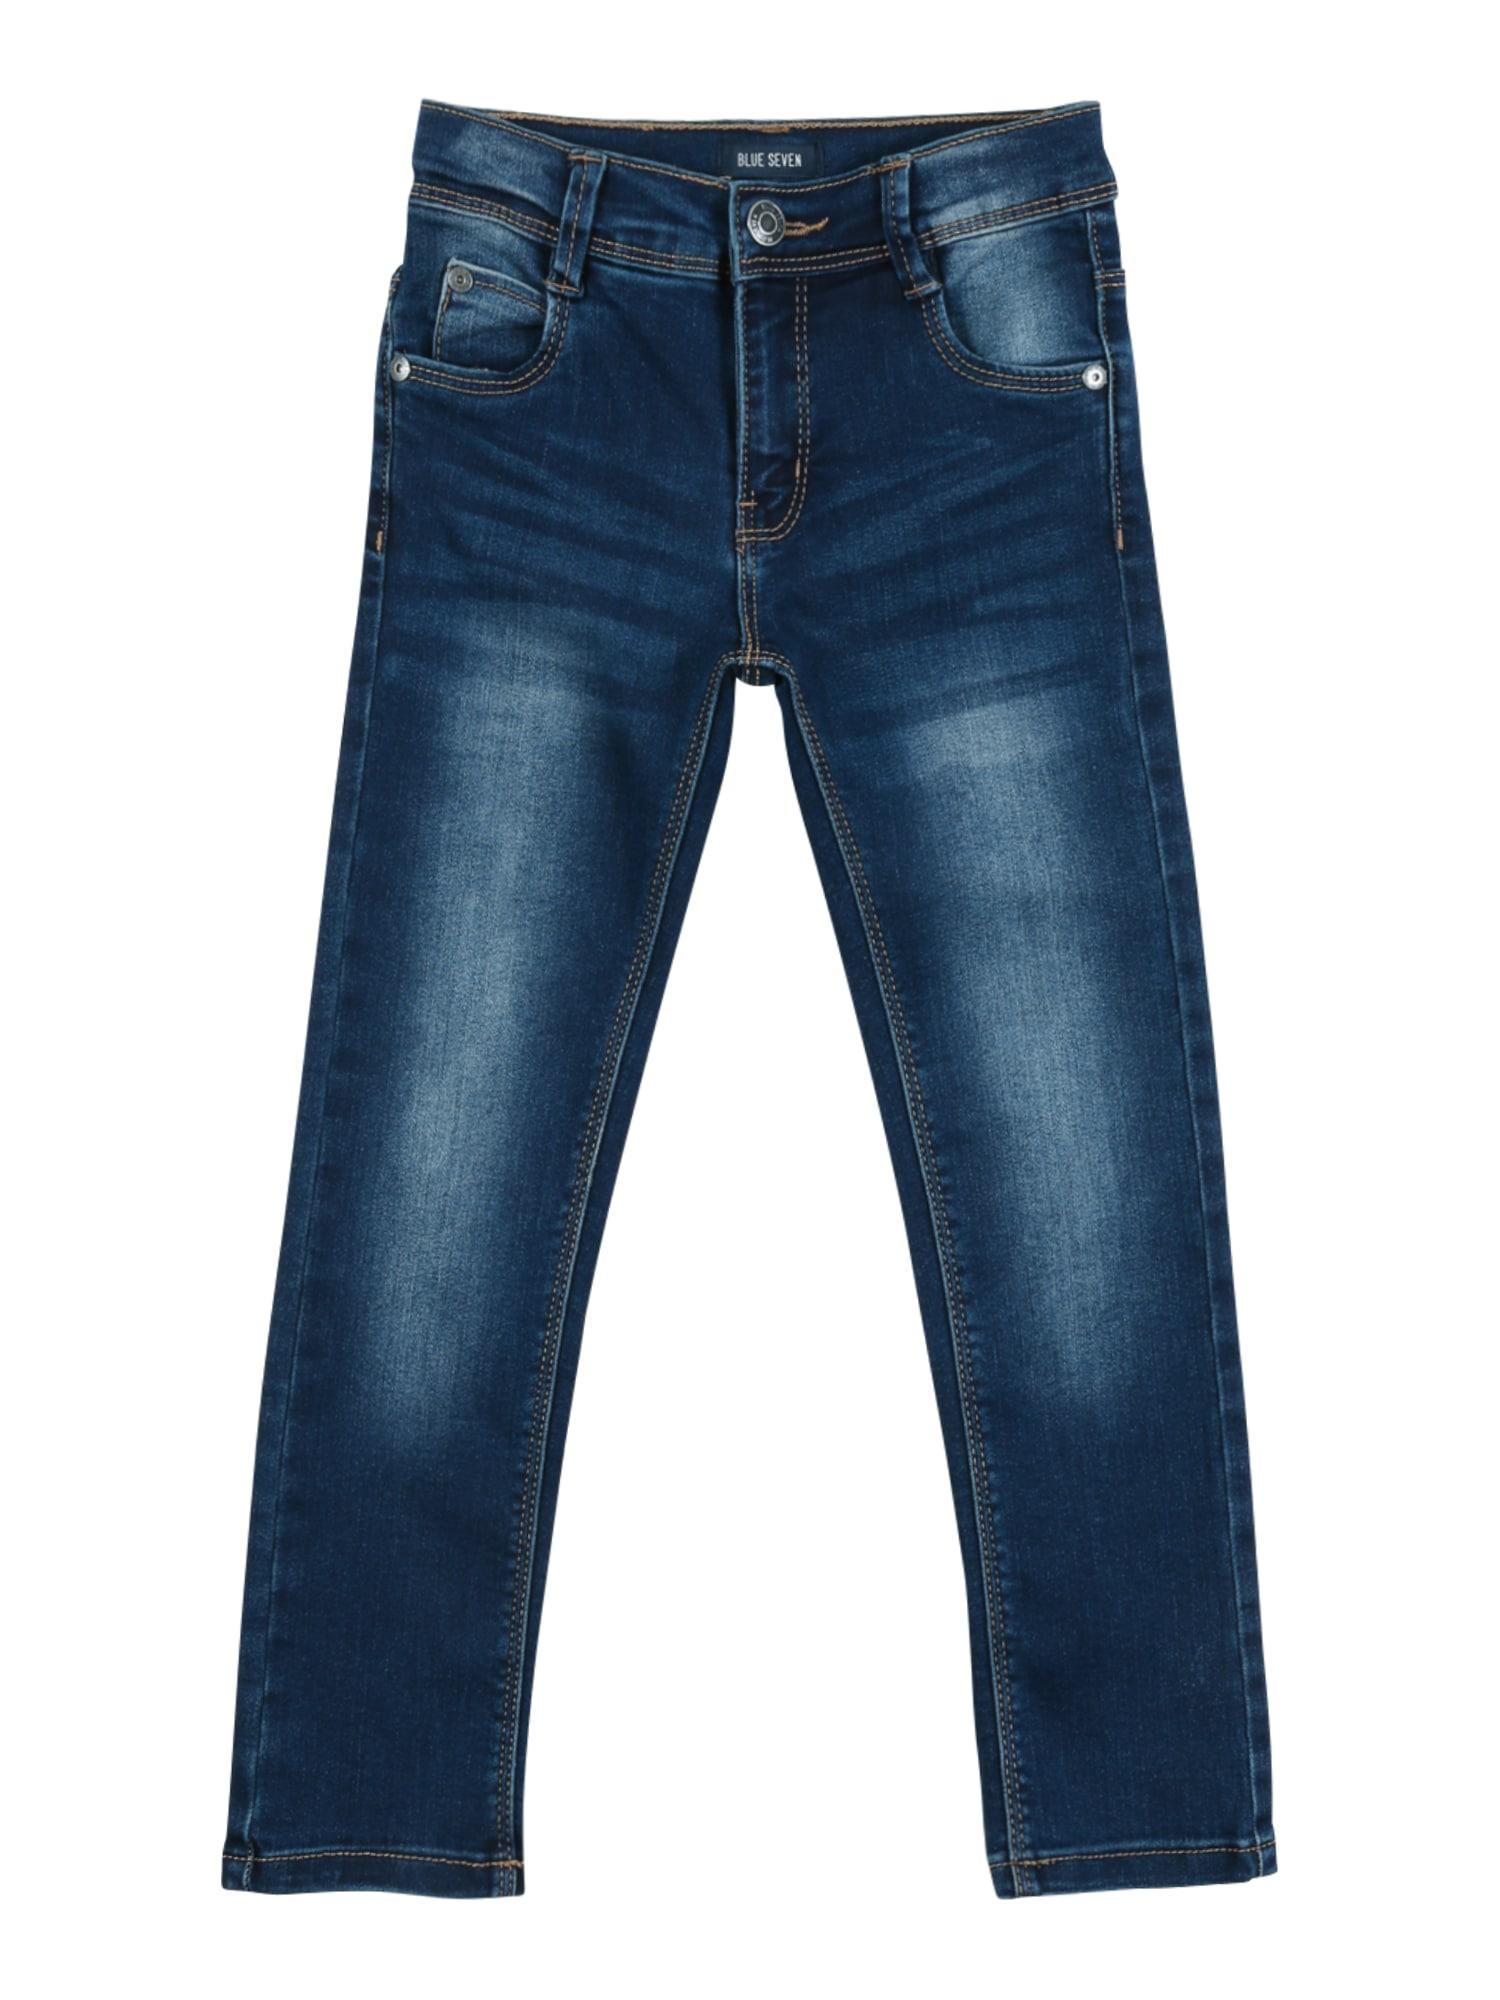 BLUE SEVEN Džínsy 'JogJeans'  tmavomodrá